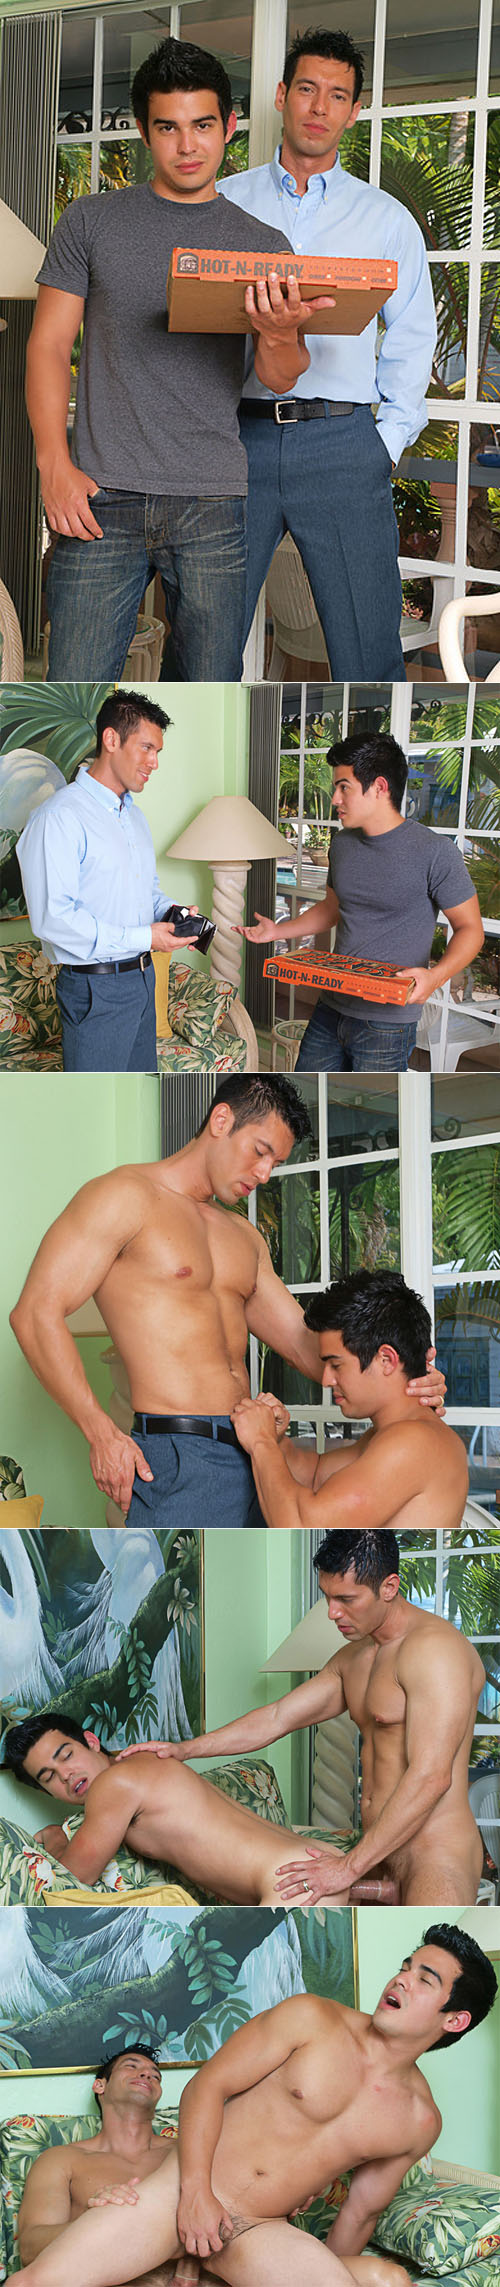 Cody Springs Naked Ideal cody springs | fagalicious - gay porn blog